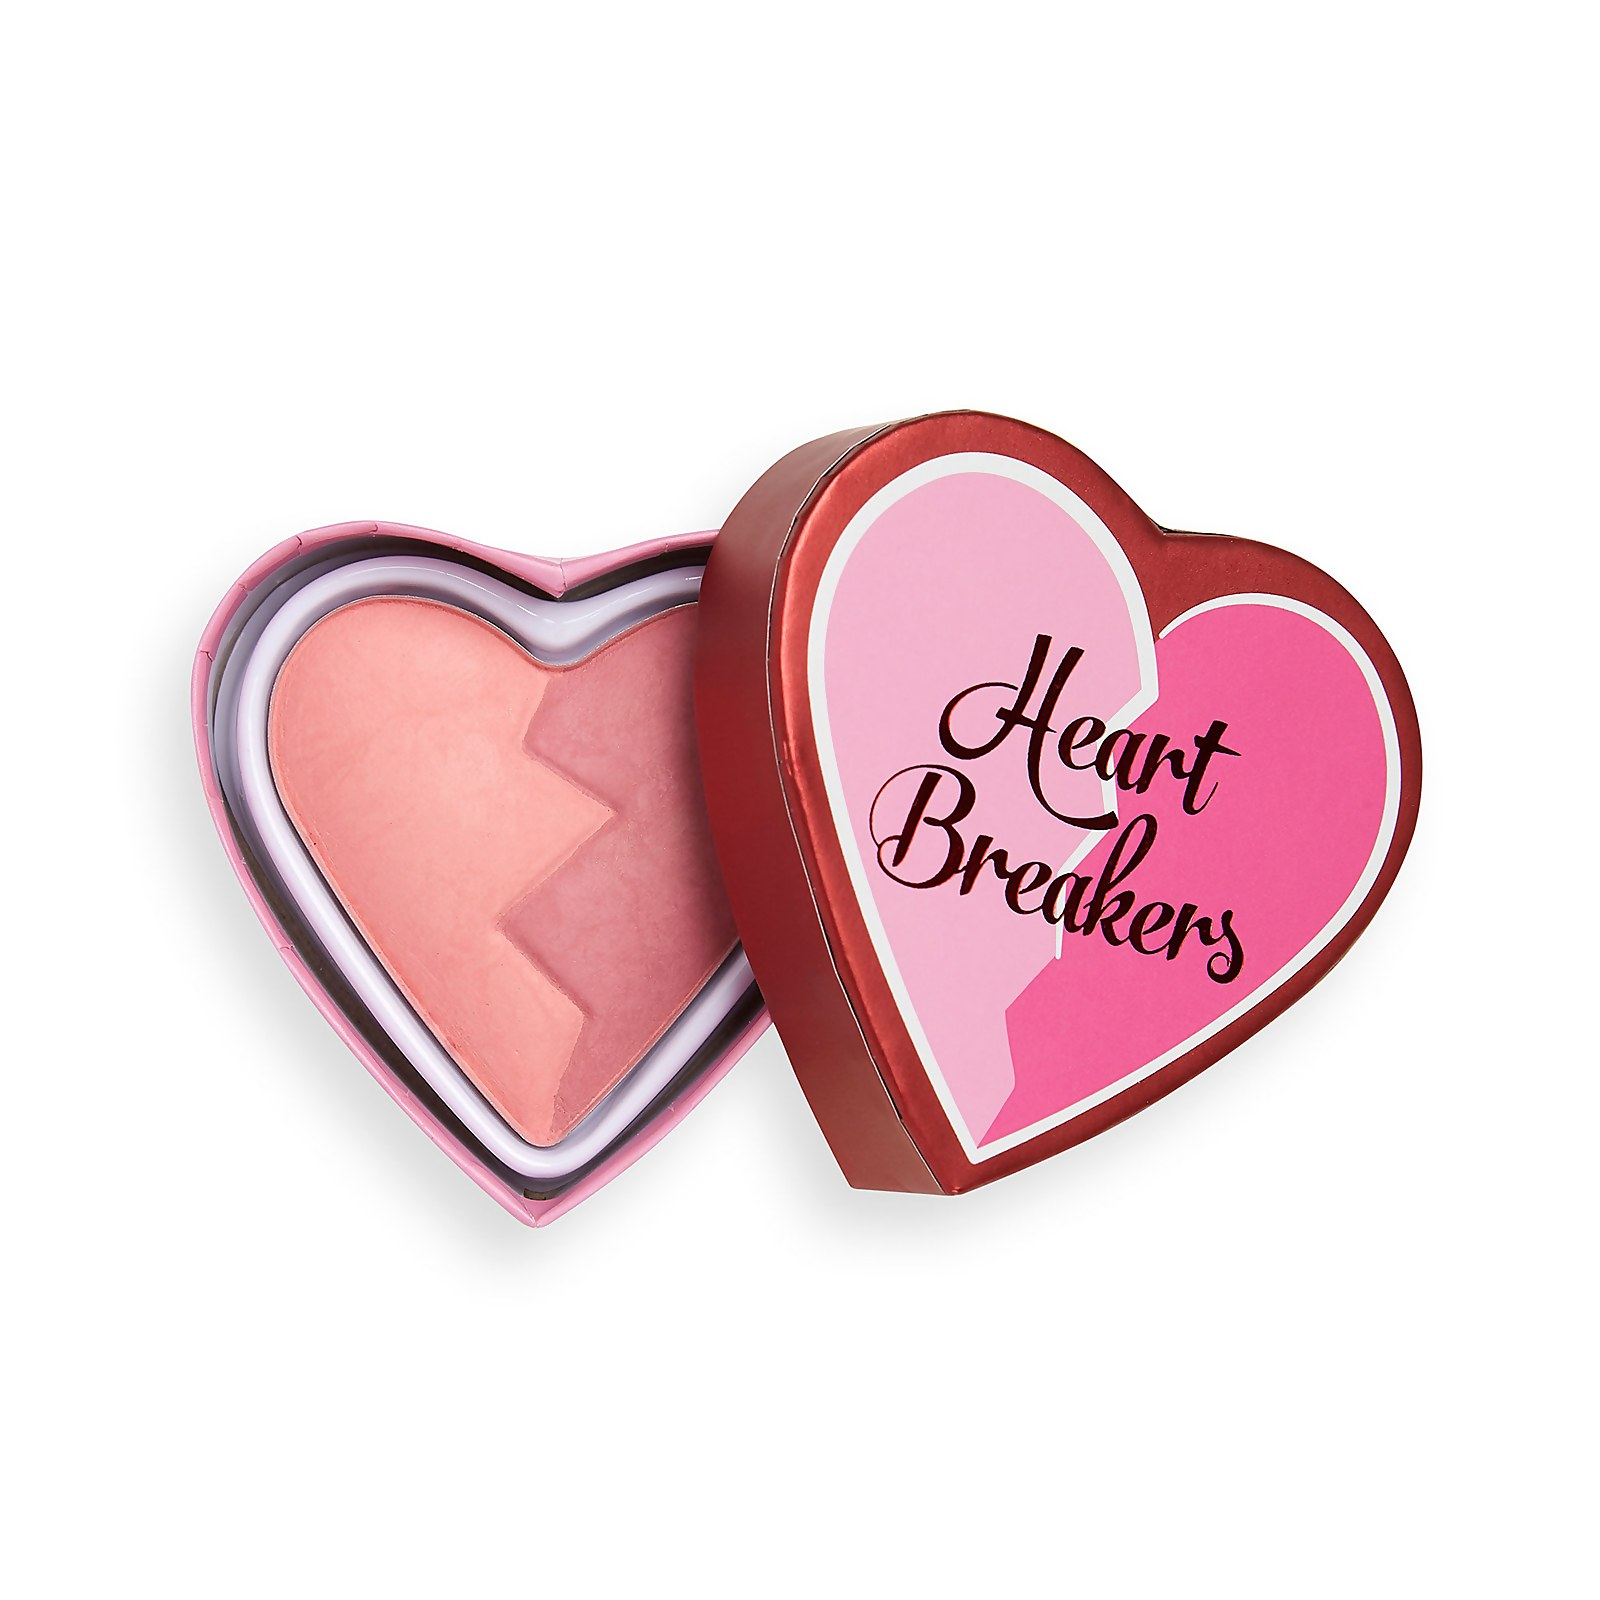 Купить Матовые румяна Revolution I Heart Revolution Heartbreakers Matte Blusher - Independent